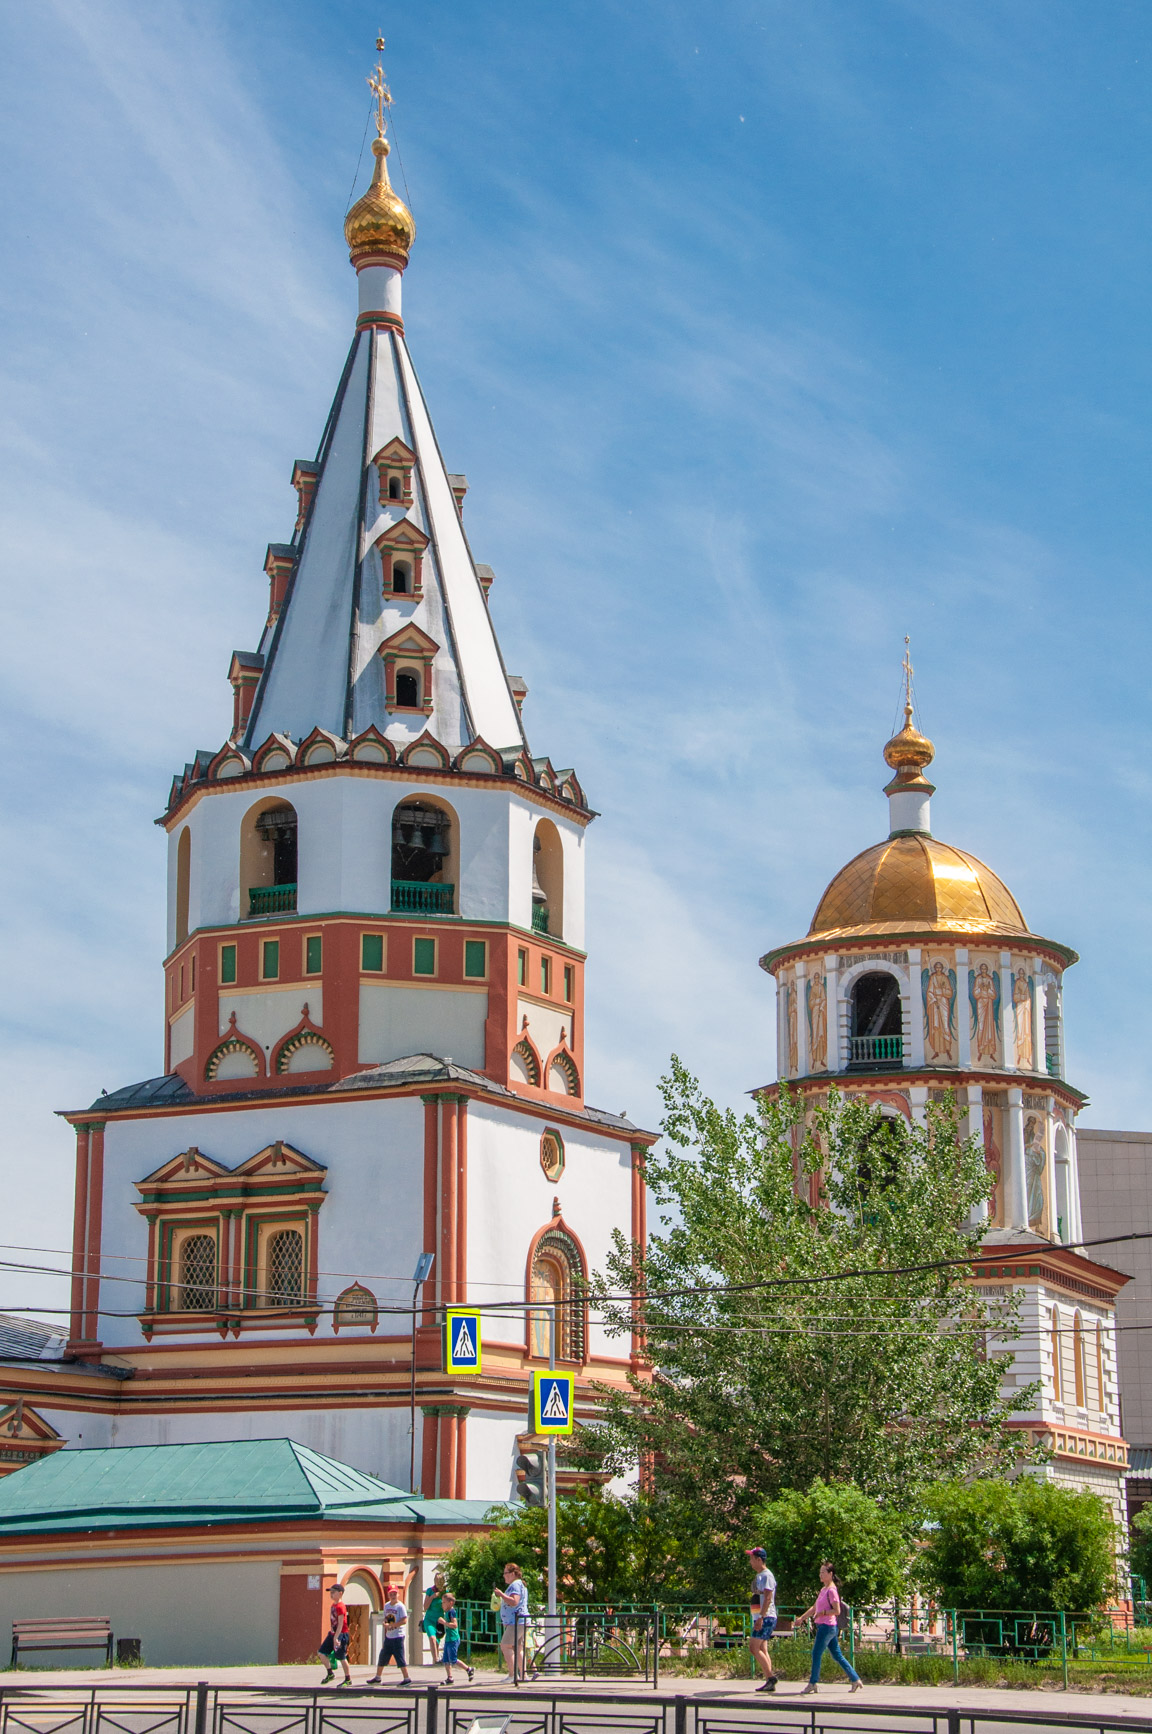 https://bubo.sk/uploads/galleries/4924/tomaskubus_rusko_irkutsk_kostolzvestovania_transsib.jpg